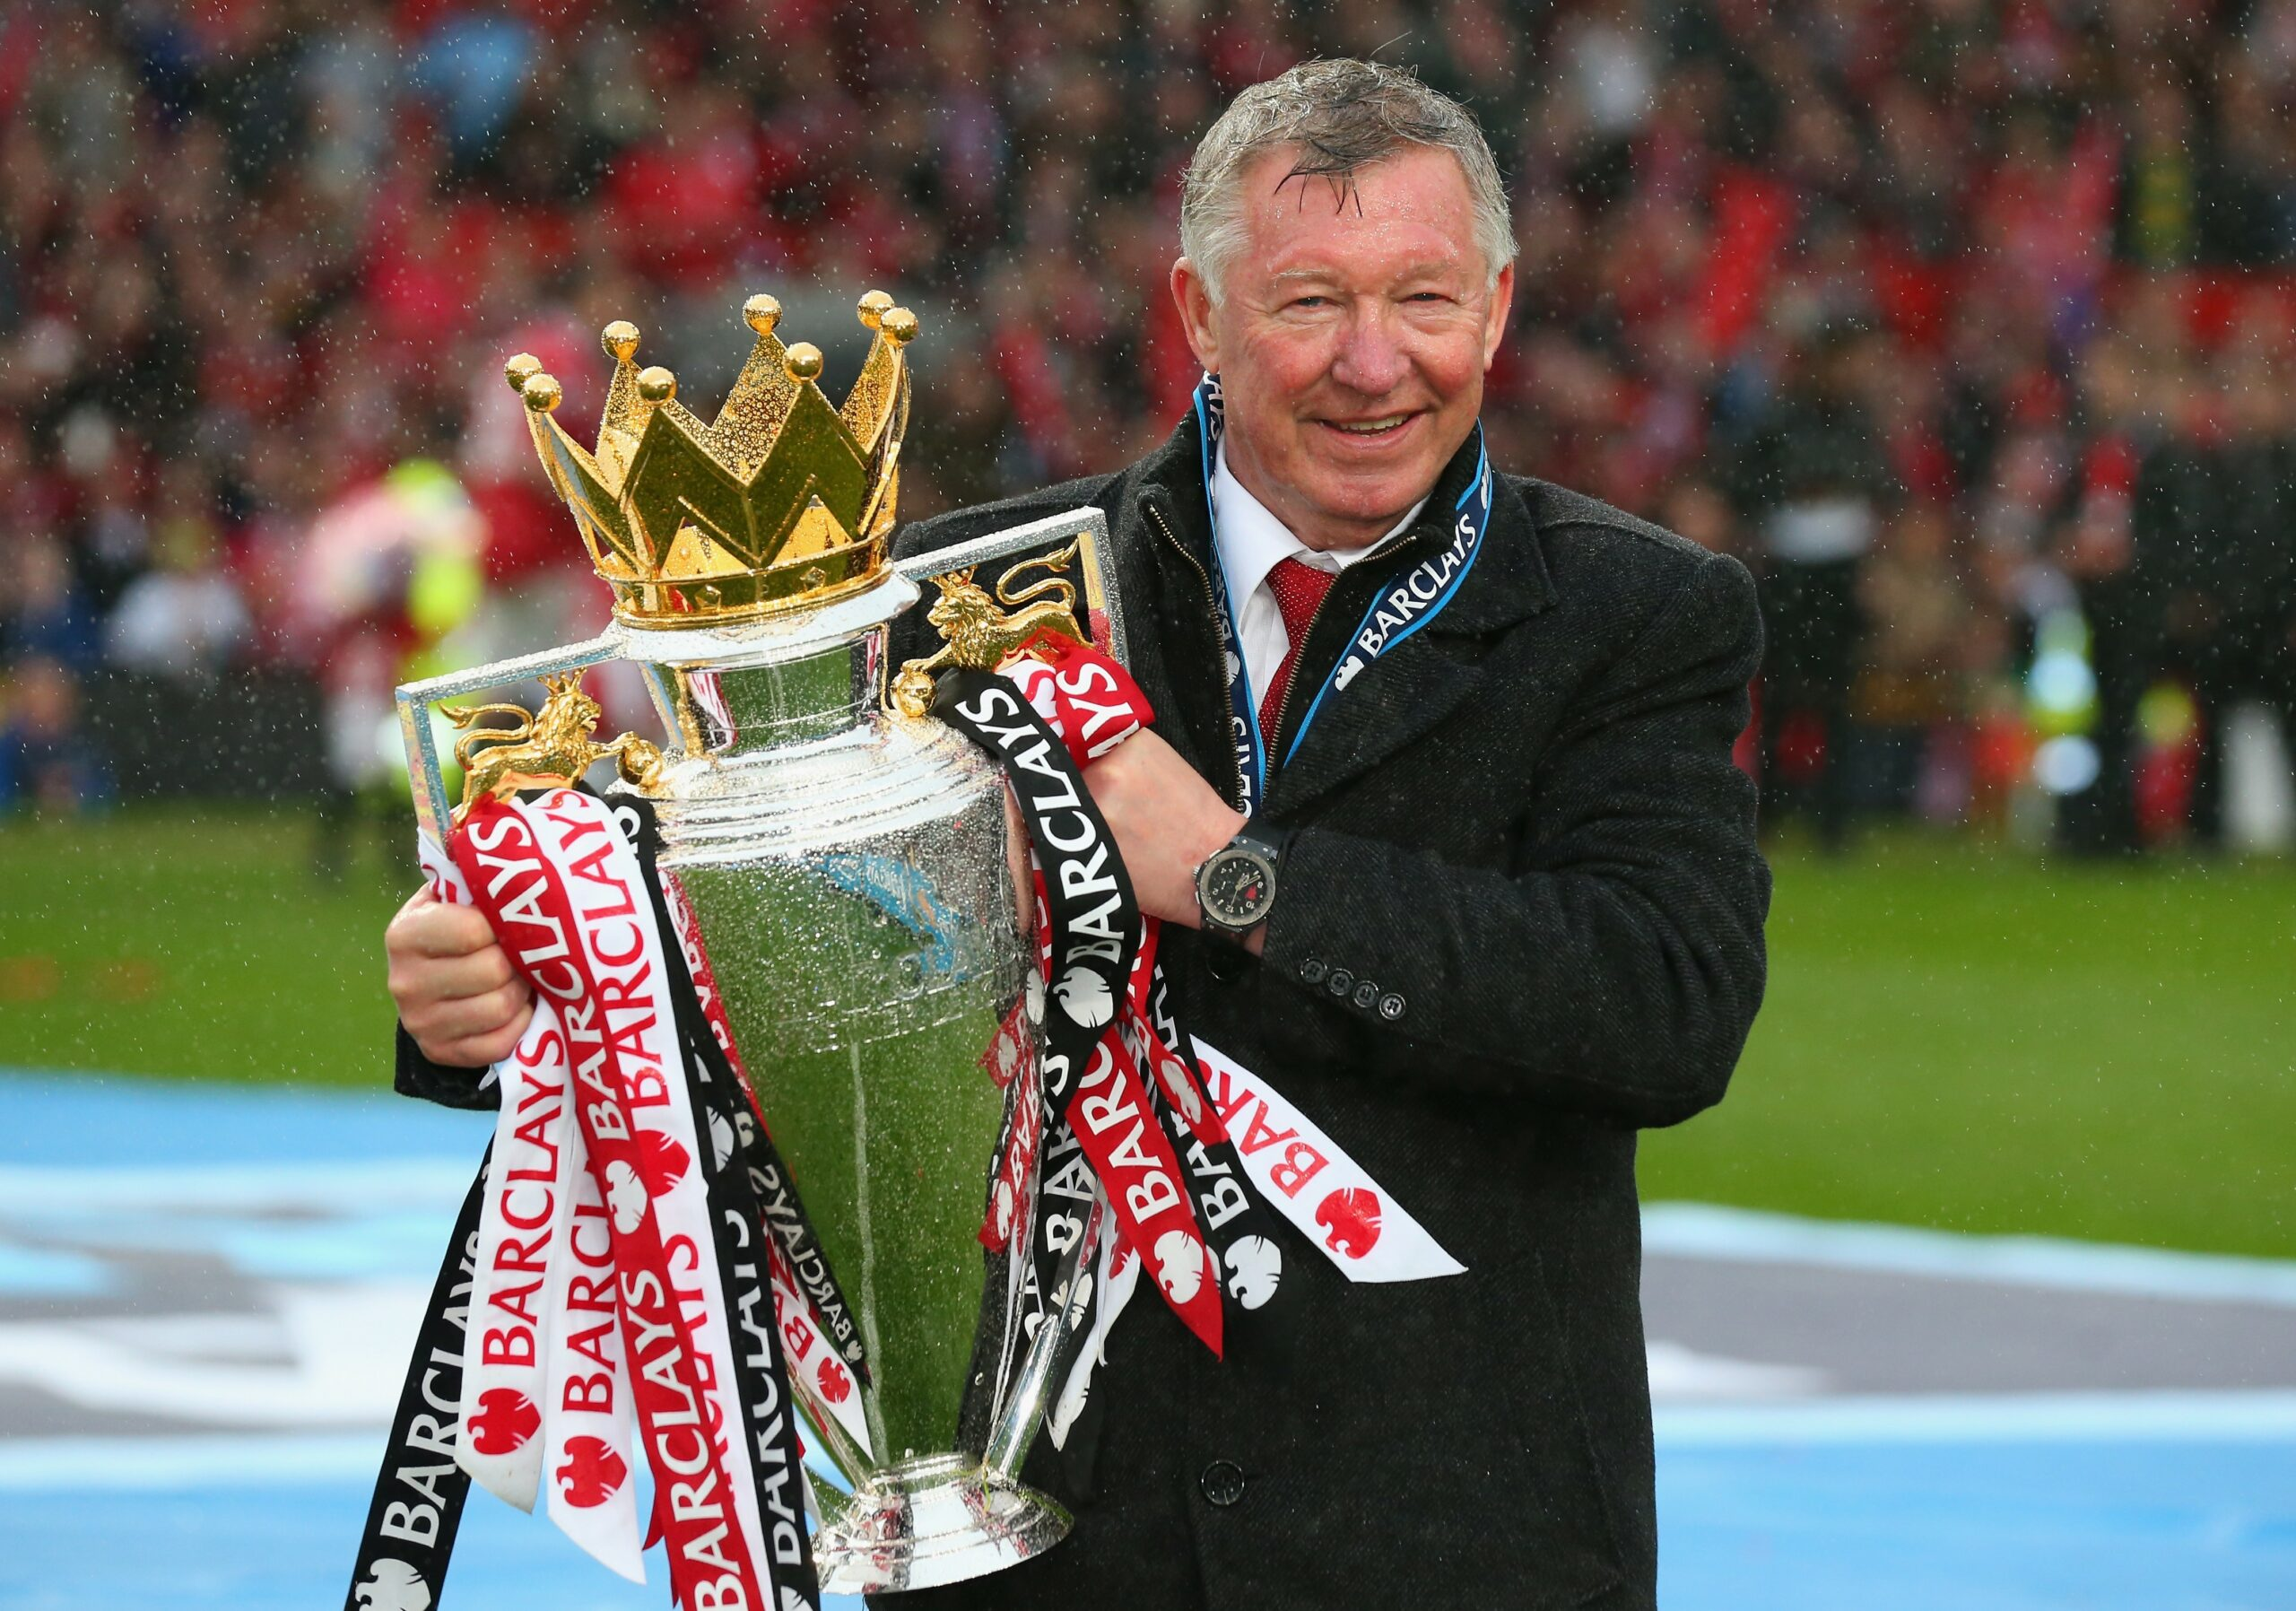 Manchester-United-v-Swansea-City-Premier-League-1584814555.jpg